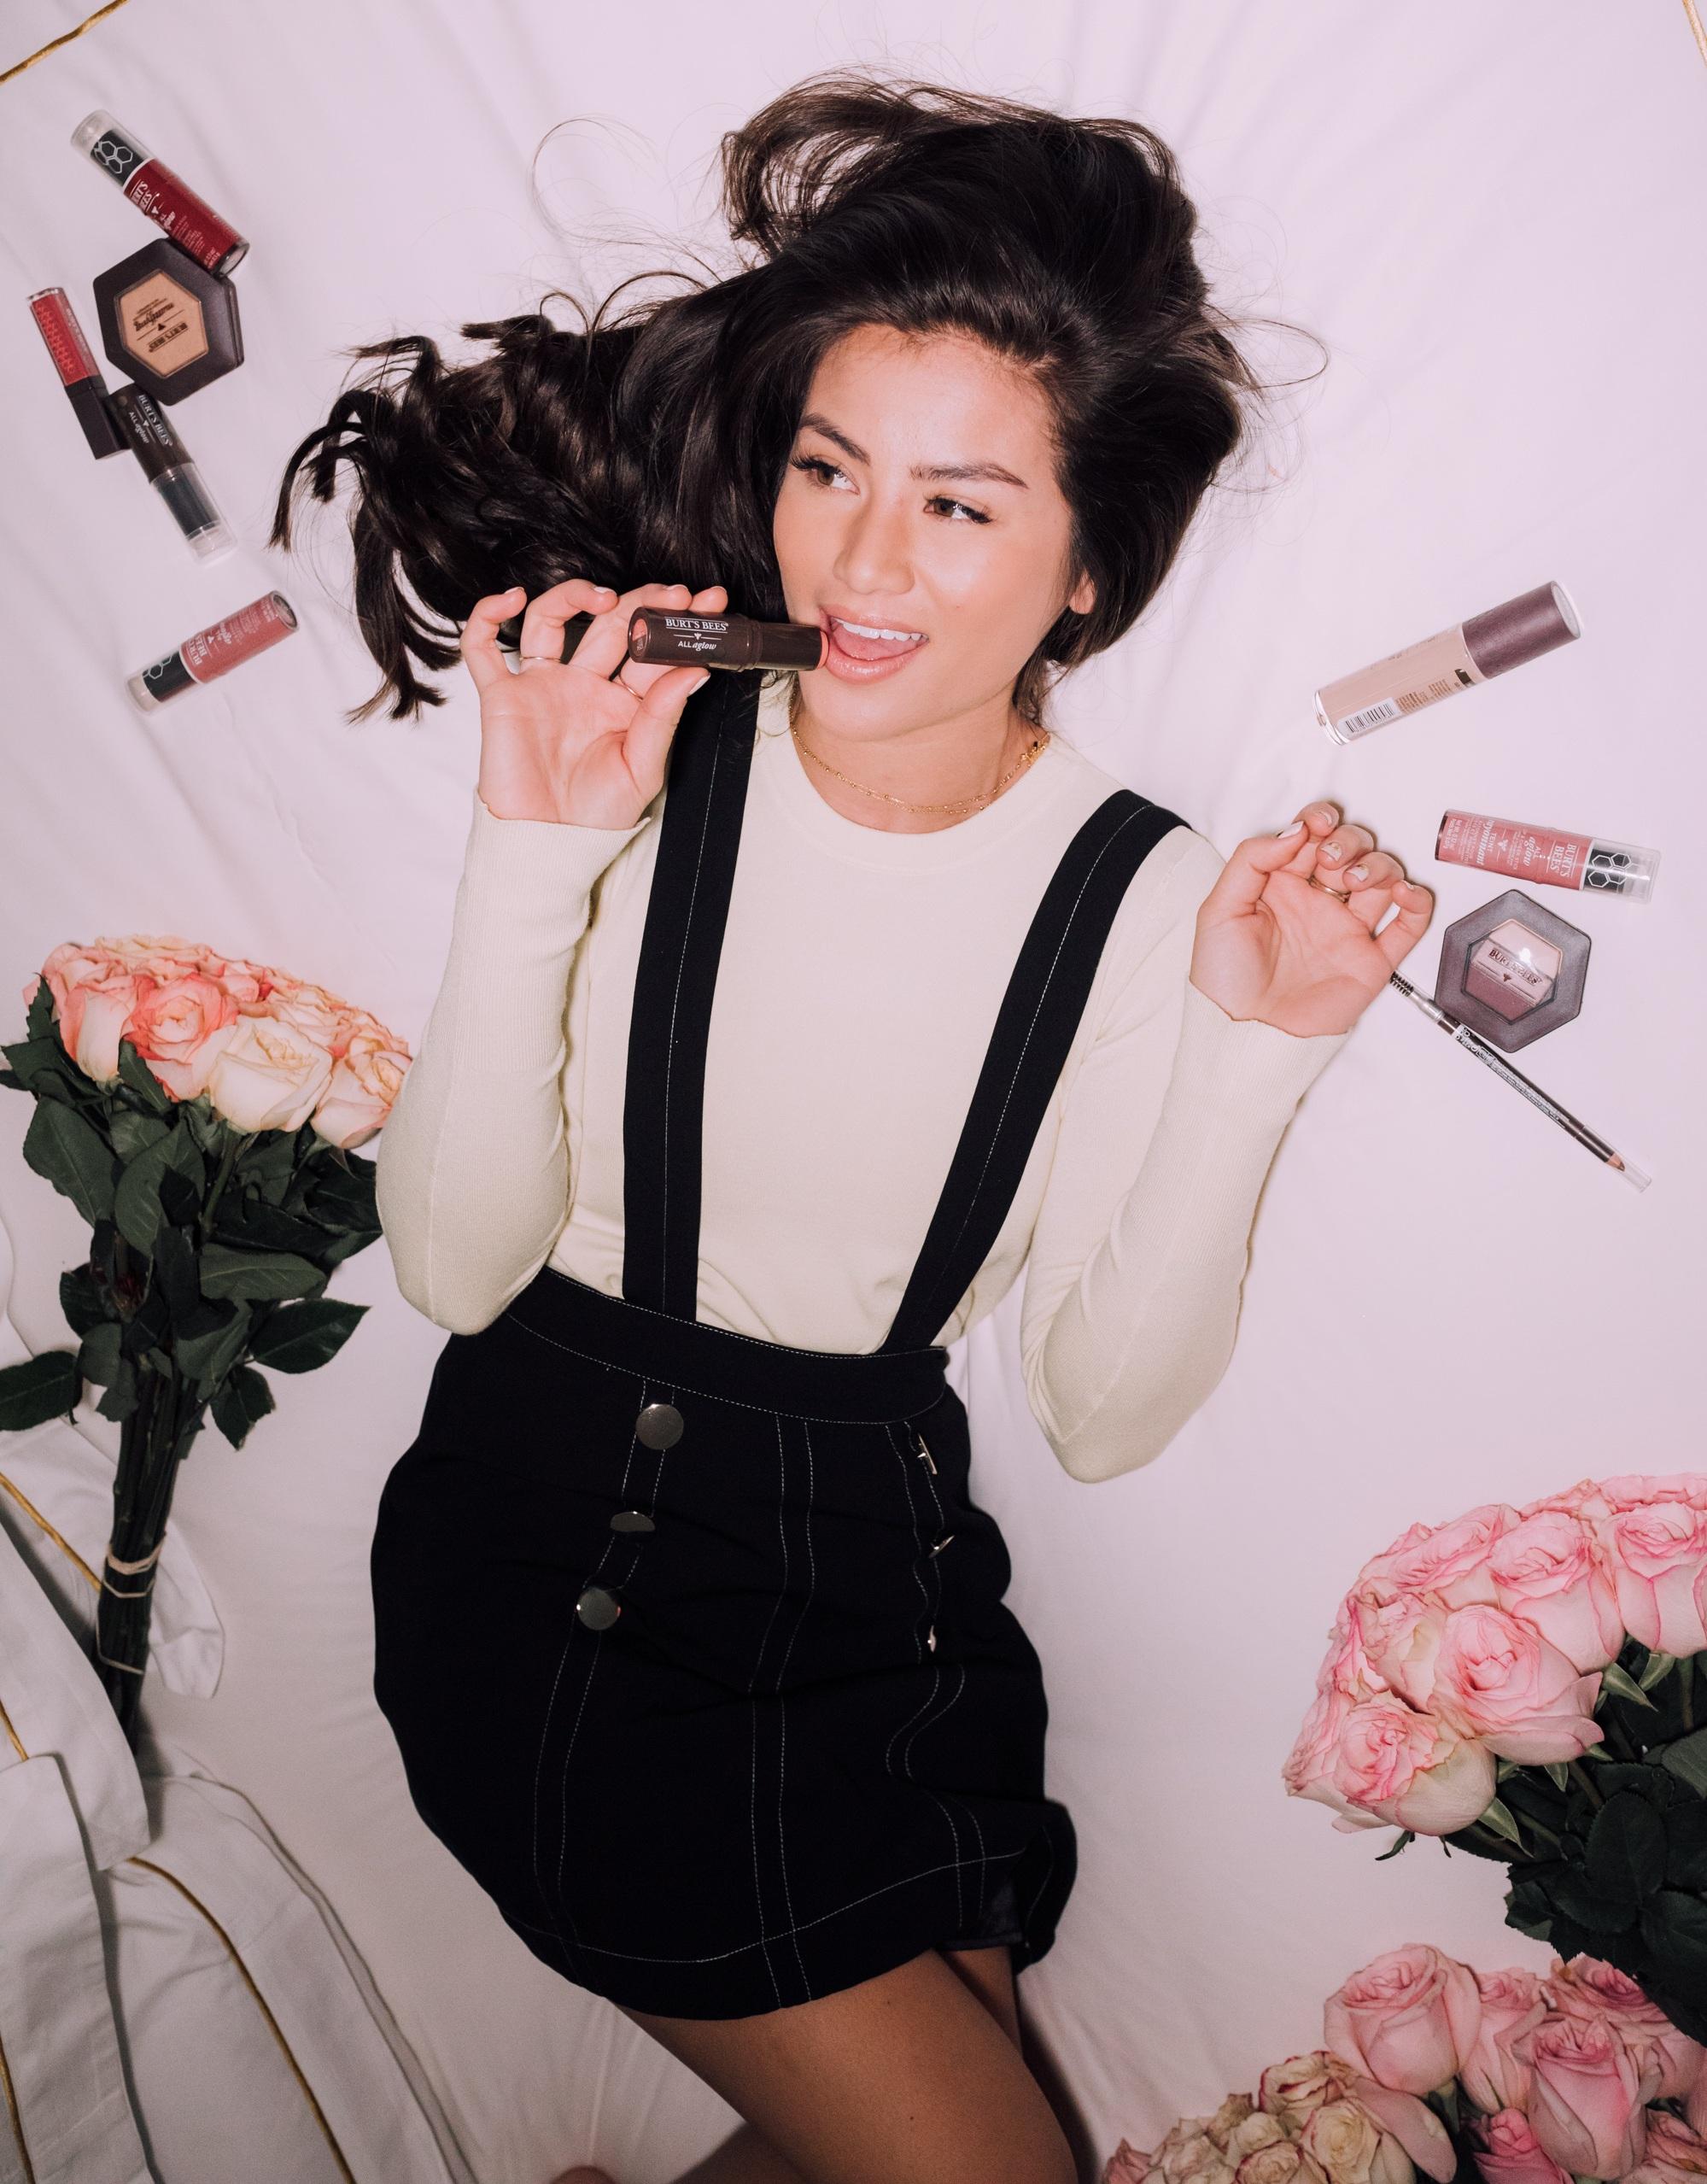 New+York+Fashion+Week+Burt%27s+Bees+Beauty+with+The+Bachelor+NY+Blogger+Caila+Quinn